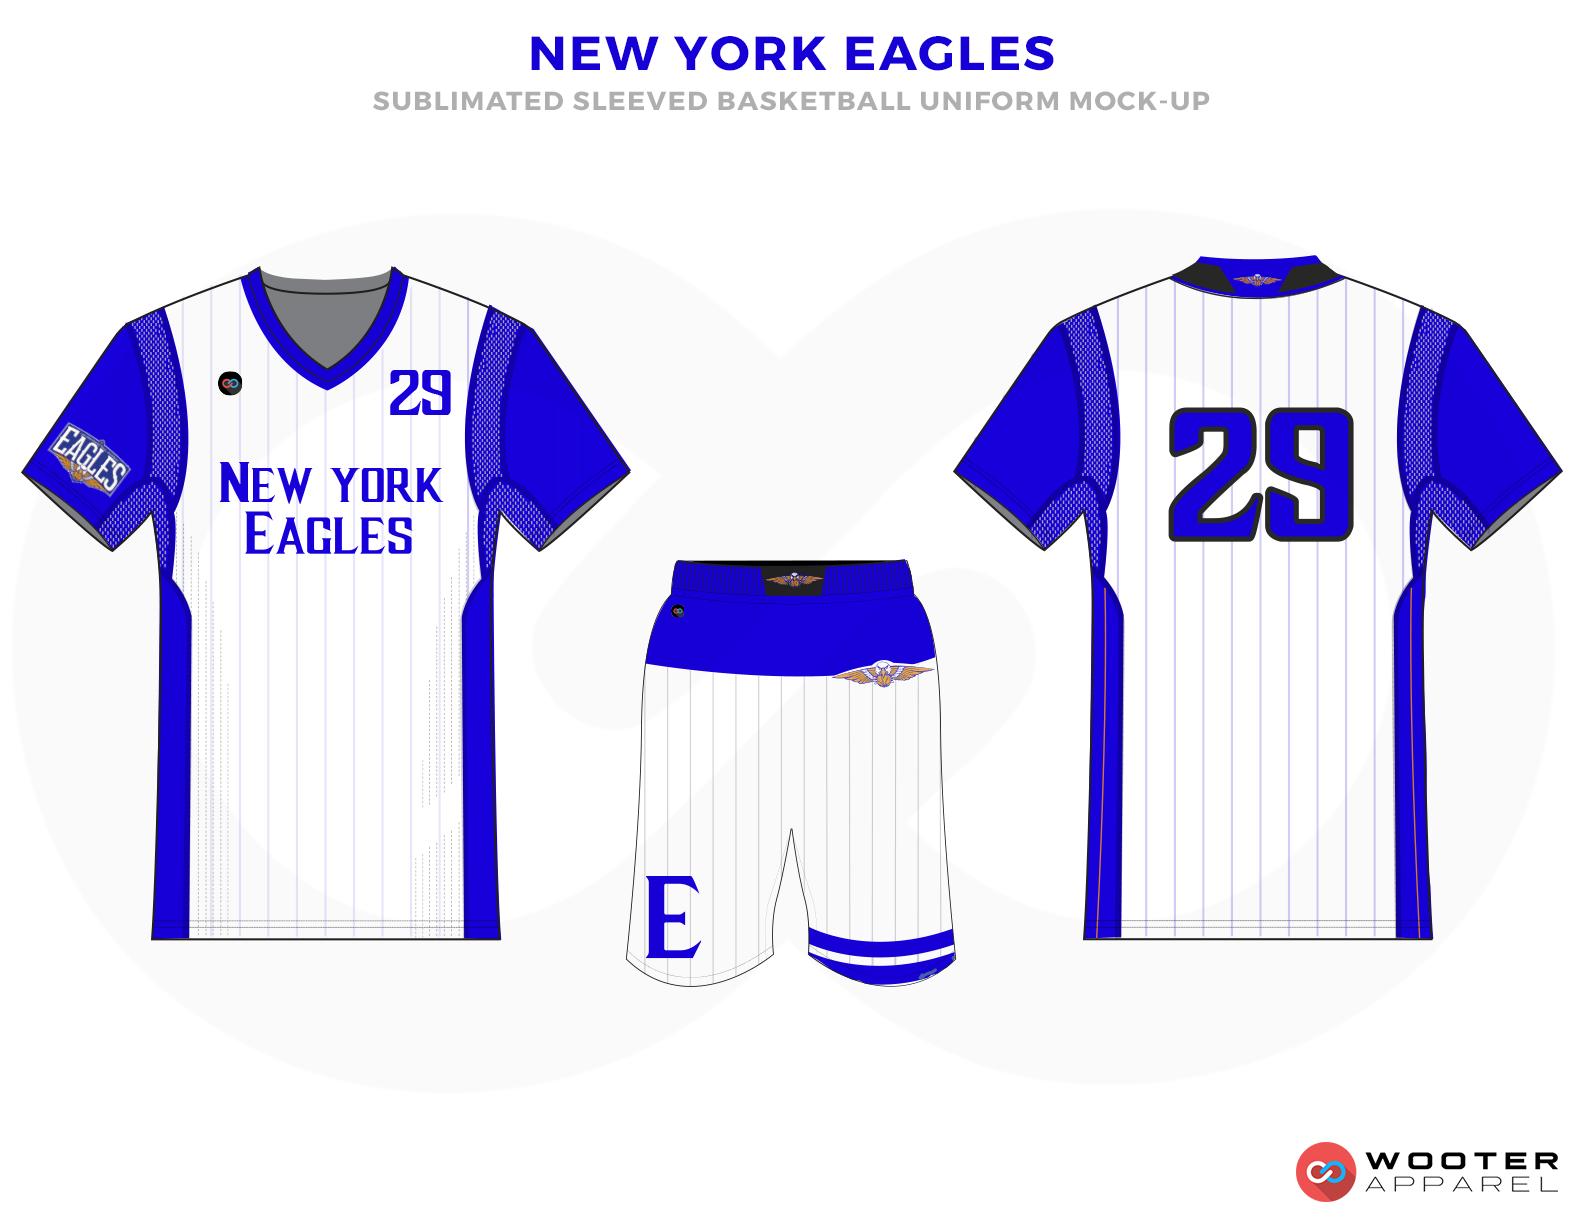 NewYorkEagles-Basketball-Uniform-Sleeved-Mockup.png